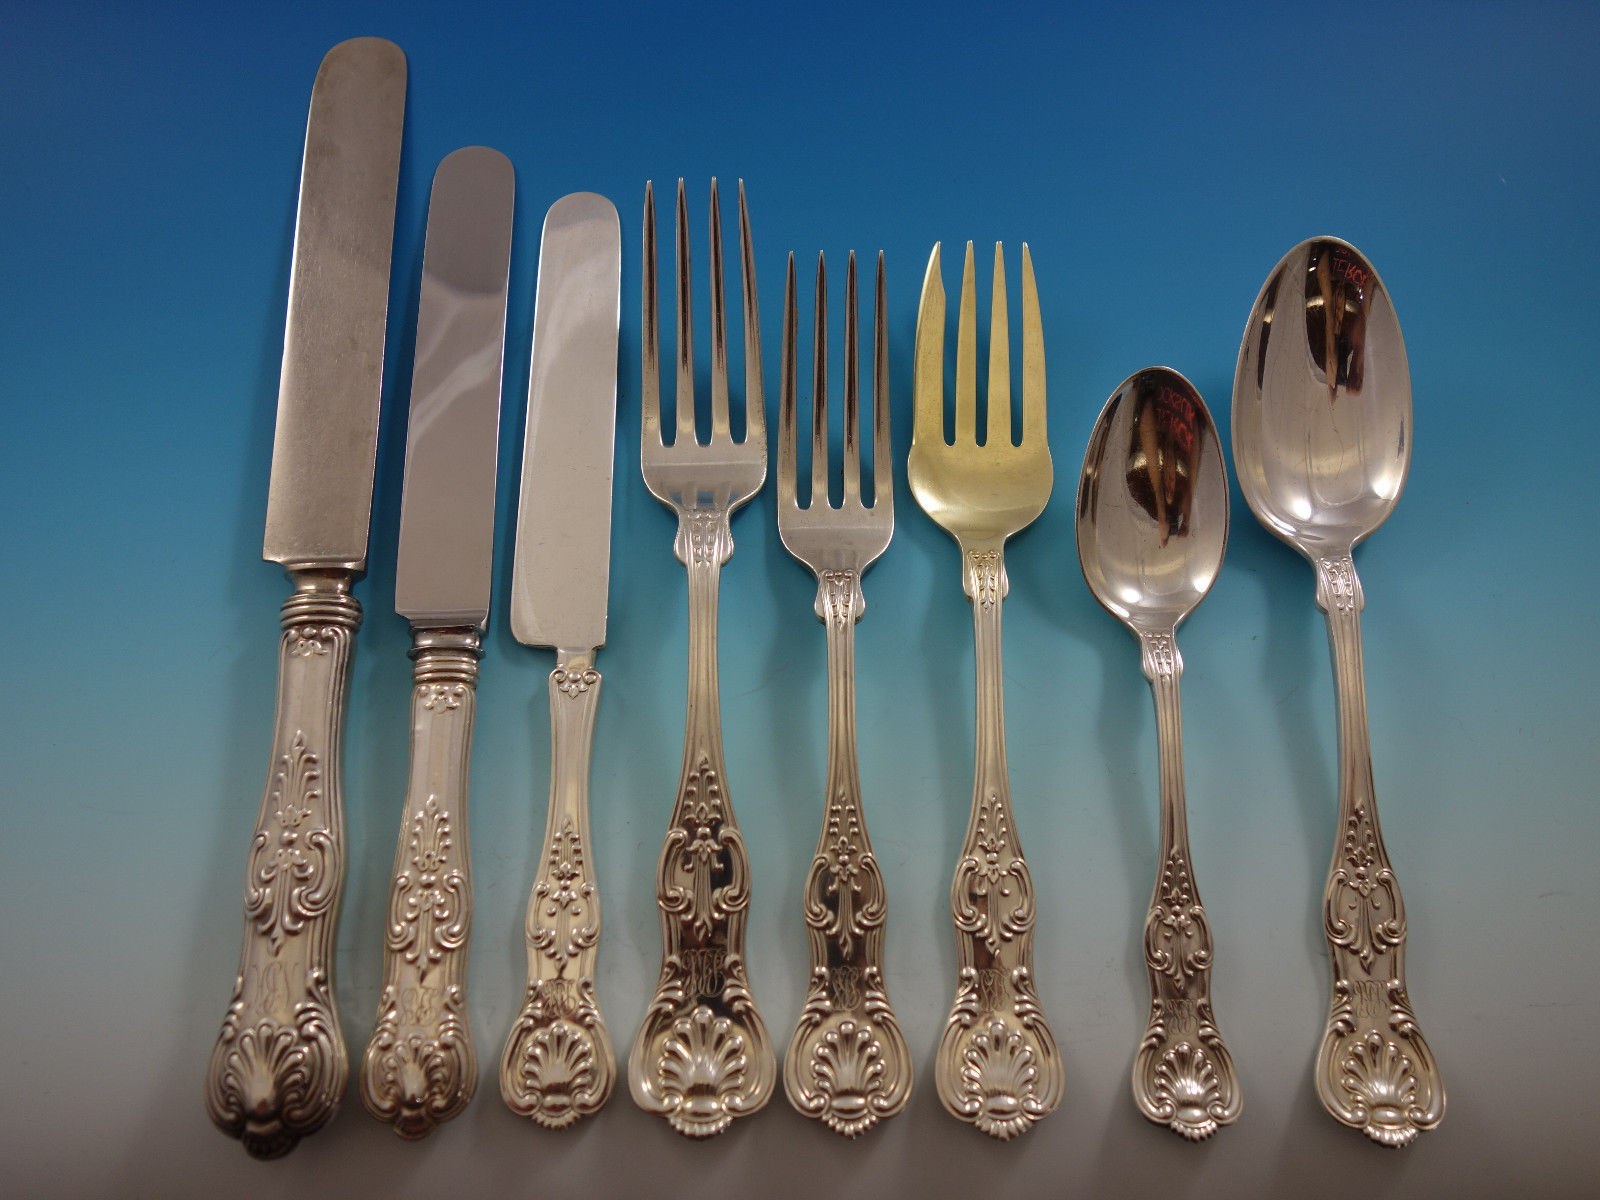 King by Dominick & Haff Sterling Silver Dinner Flatware Set 12 Service 100 Pcs